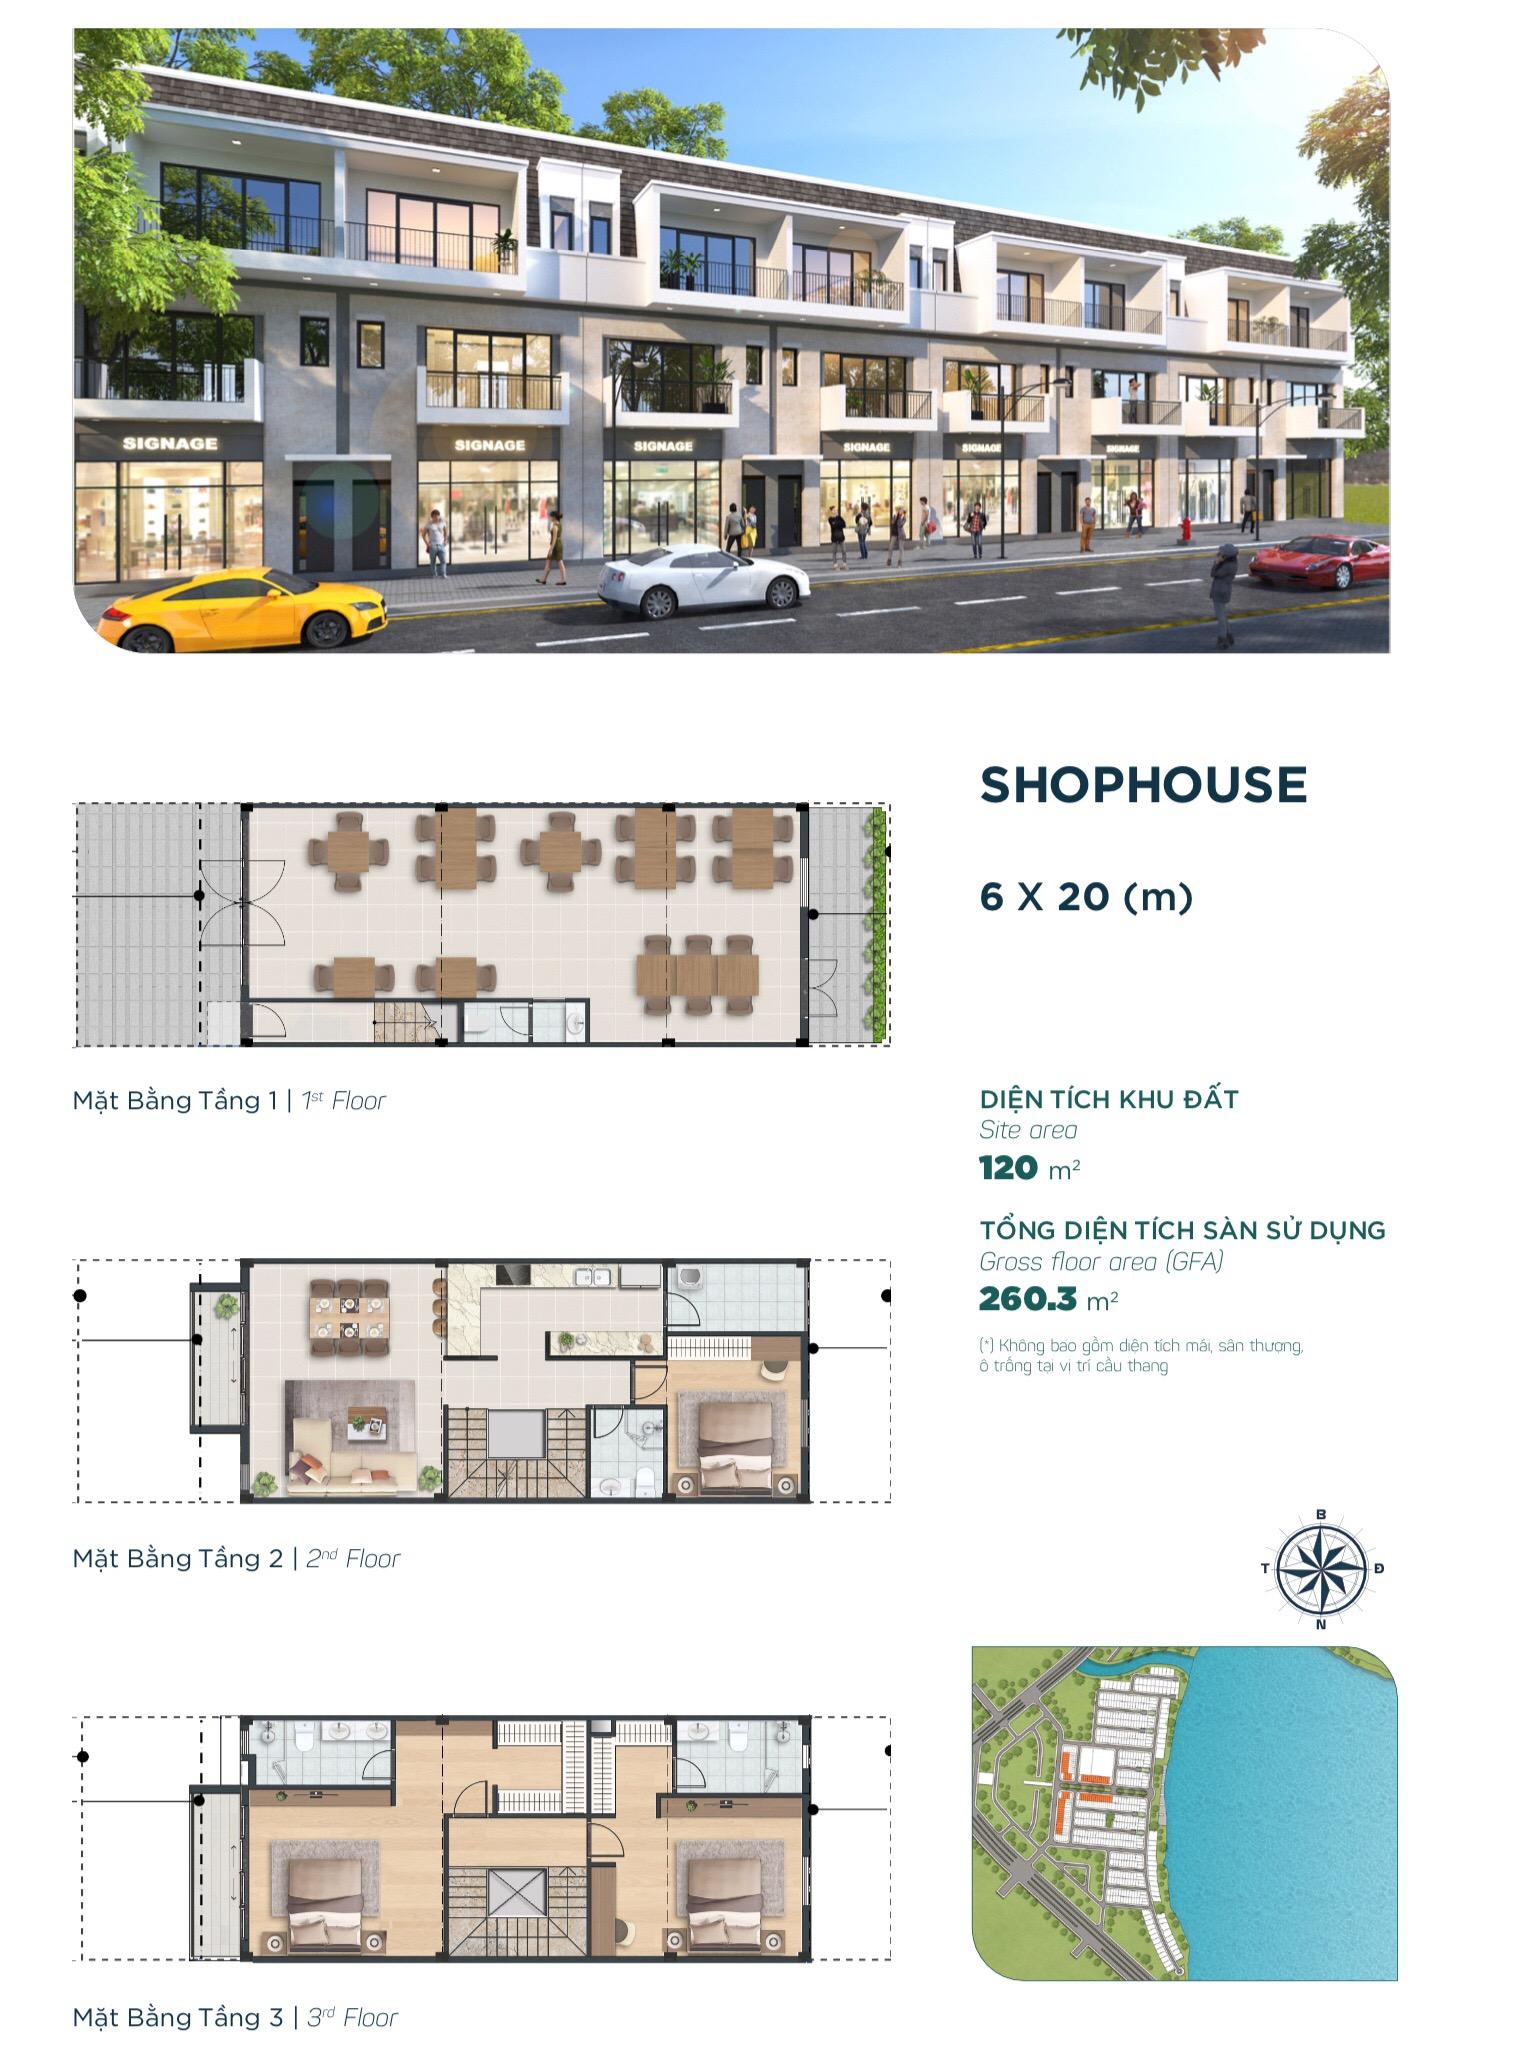 shop house aqua city - the elite 6x20